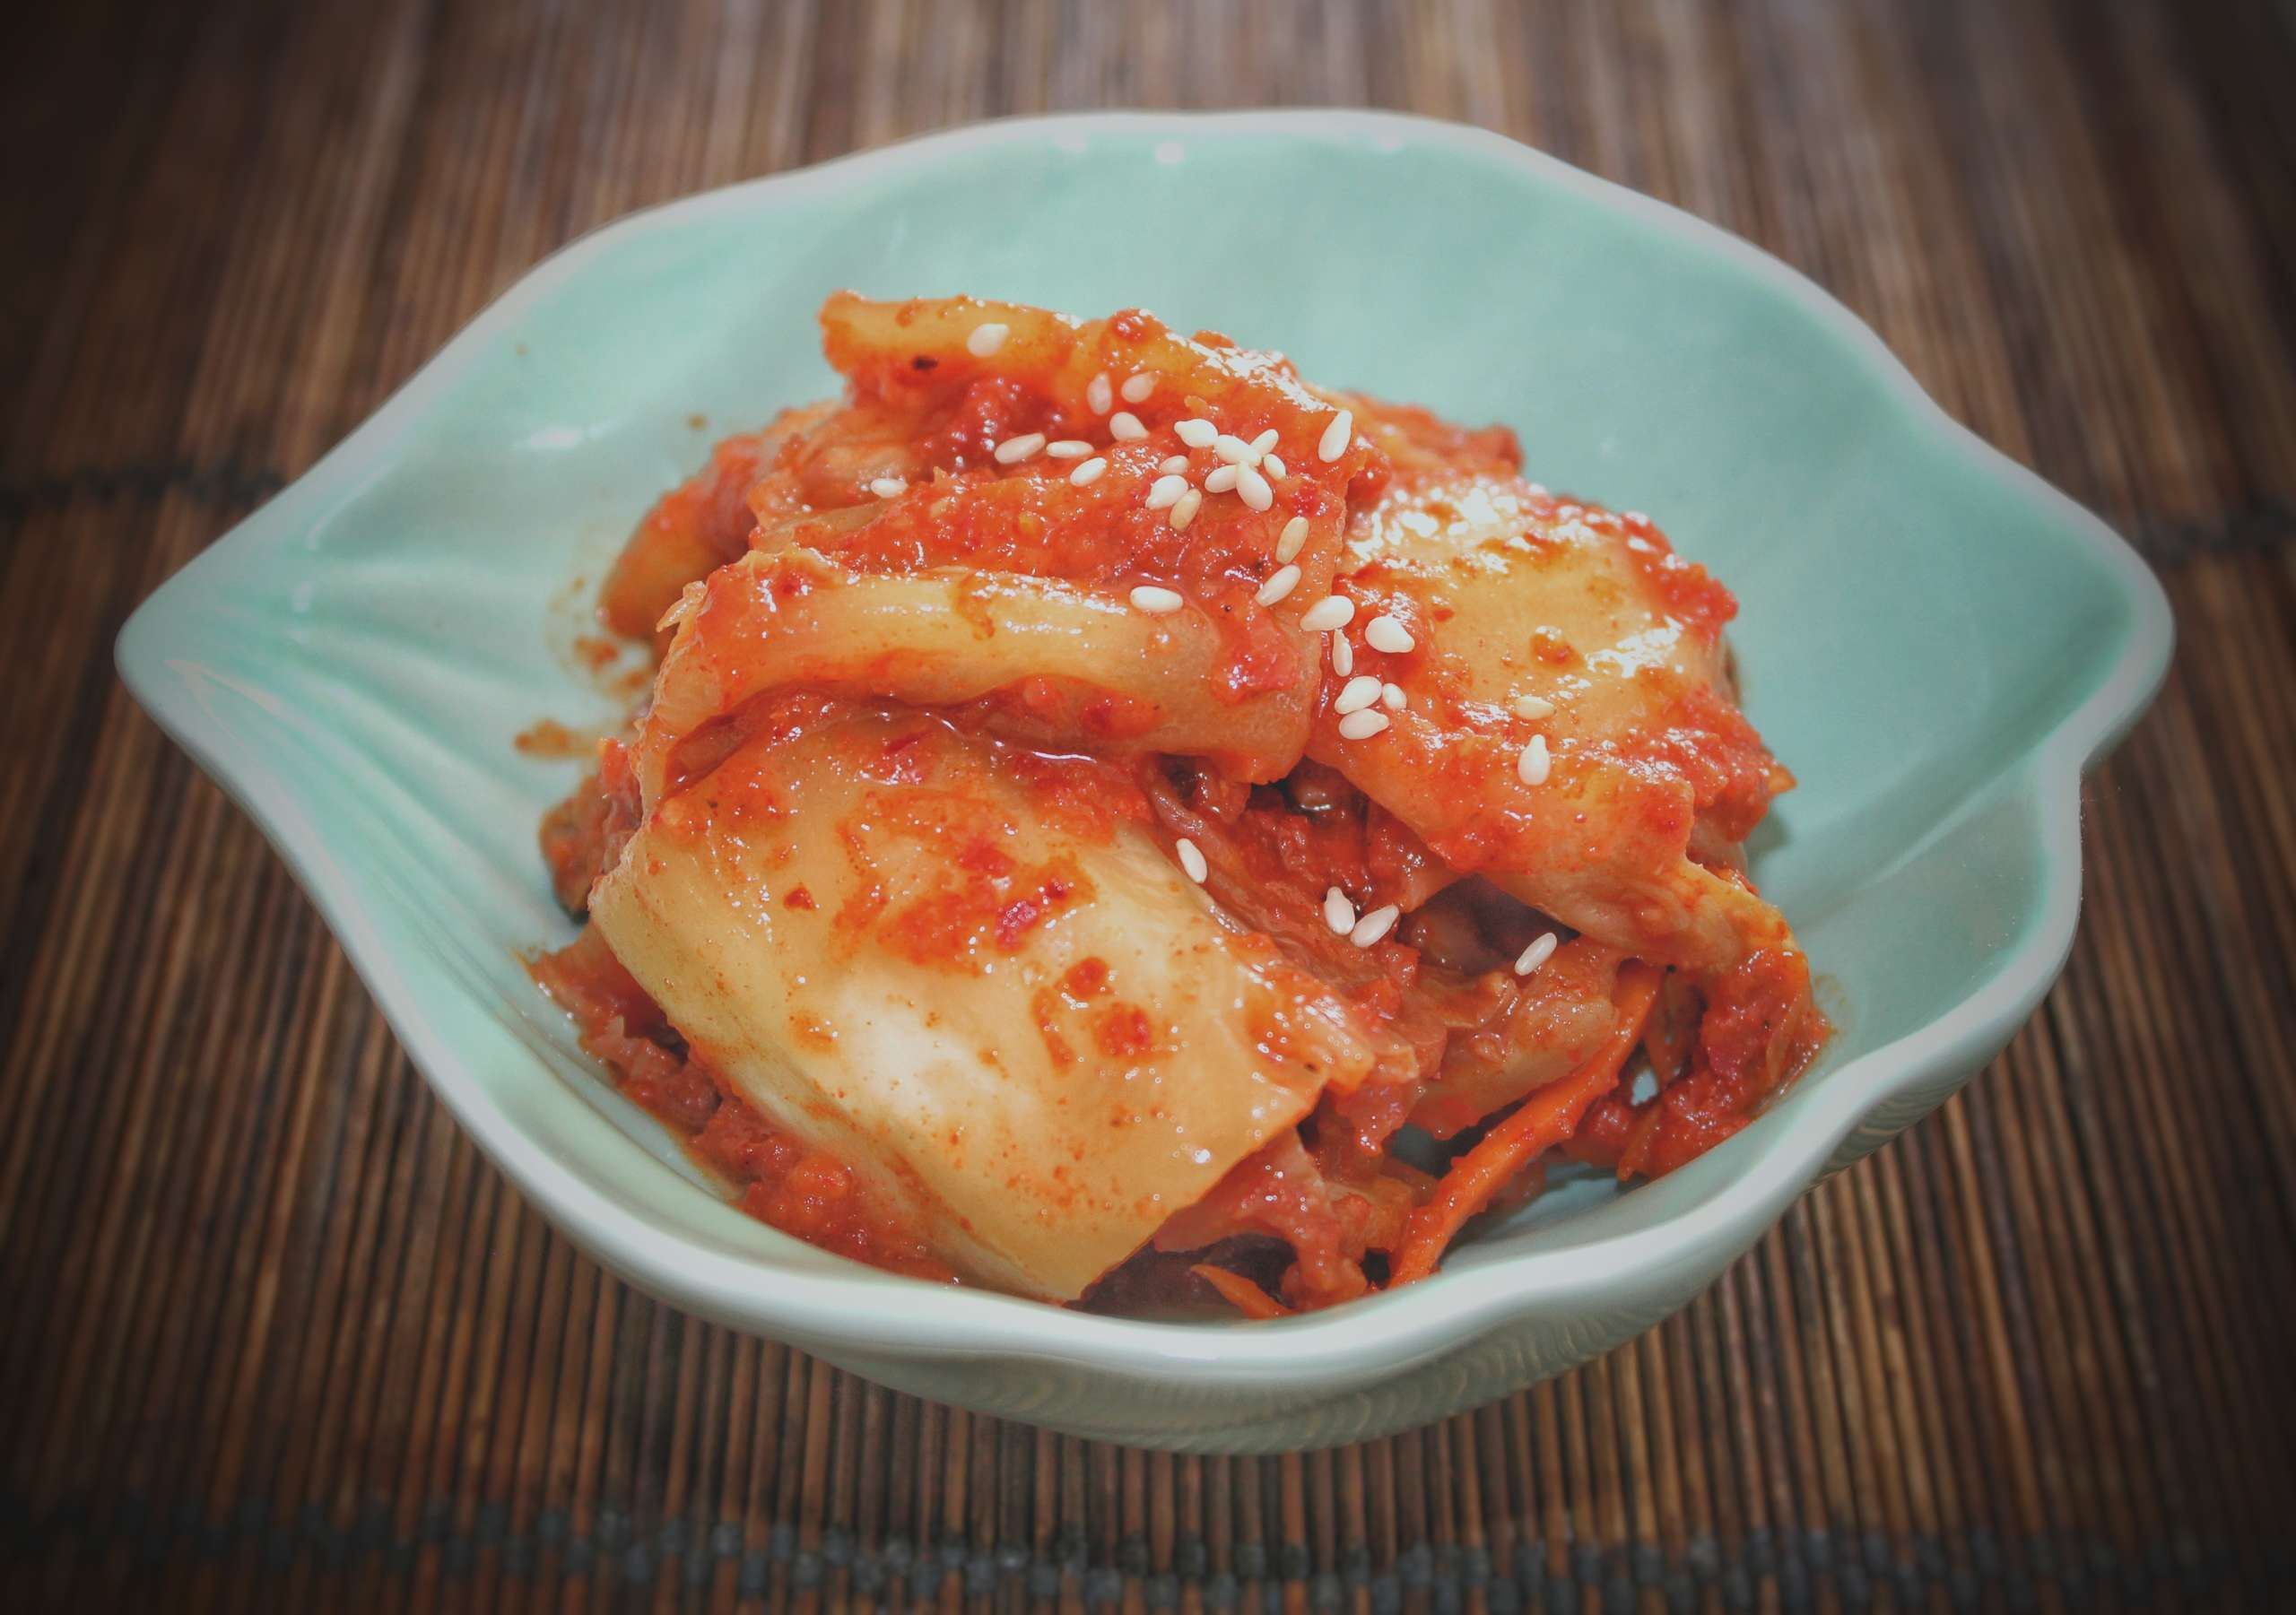 Kimchi fait Maison (1 euro)